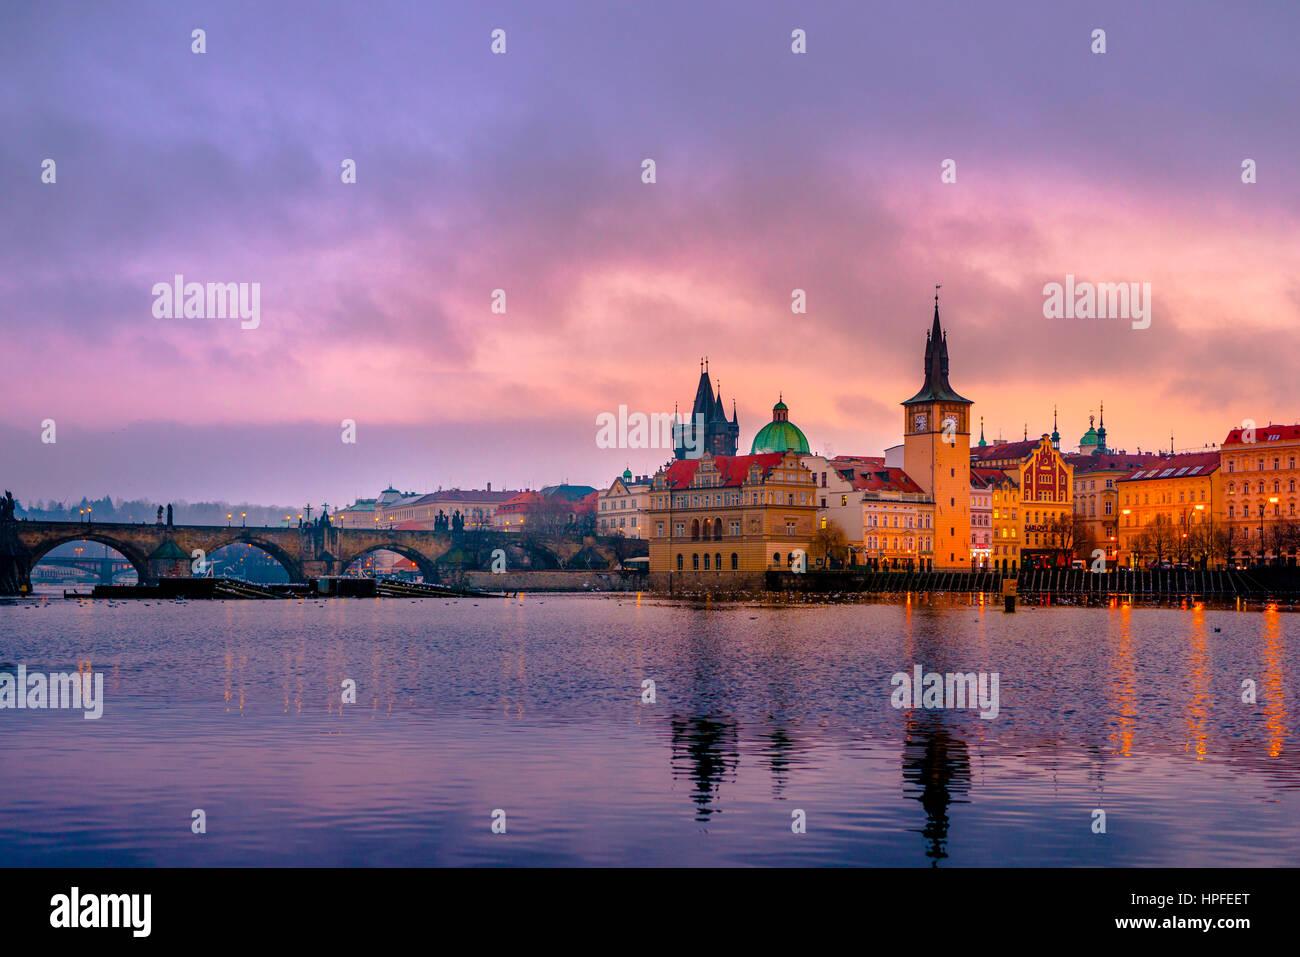 Vltava, Karlsbrücke, Brückenturm, Sonnenaufgang, Altstadt, Prag, Böhmen, Tschechische Republik Stockbild